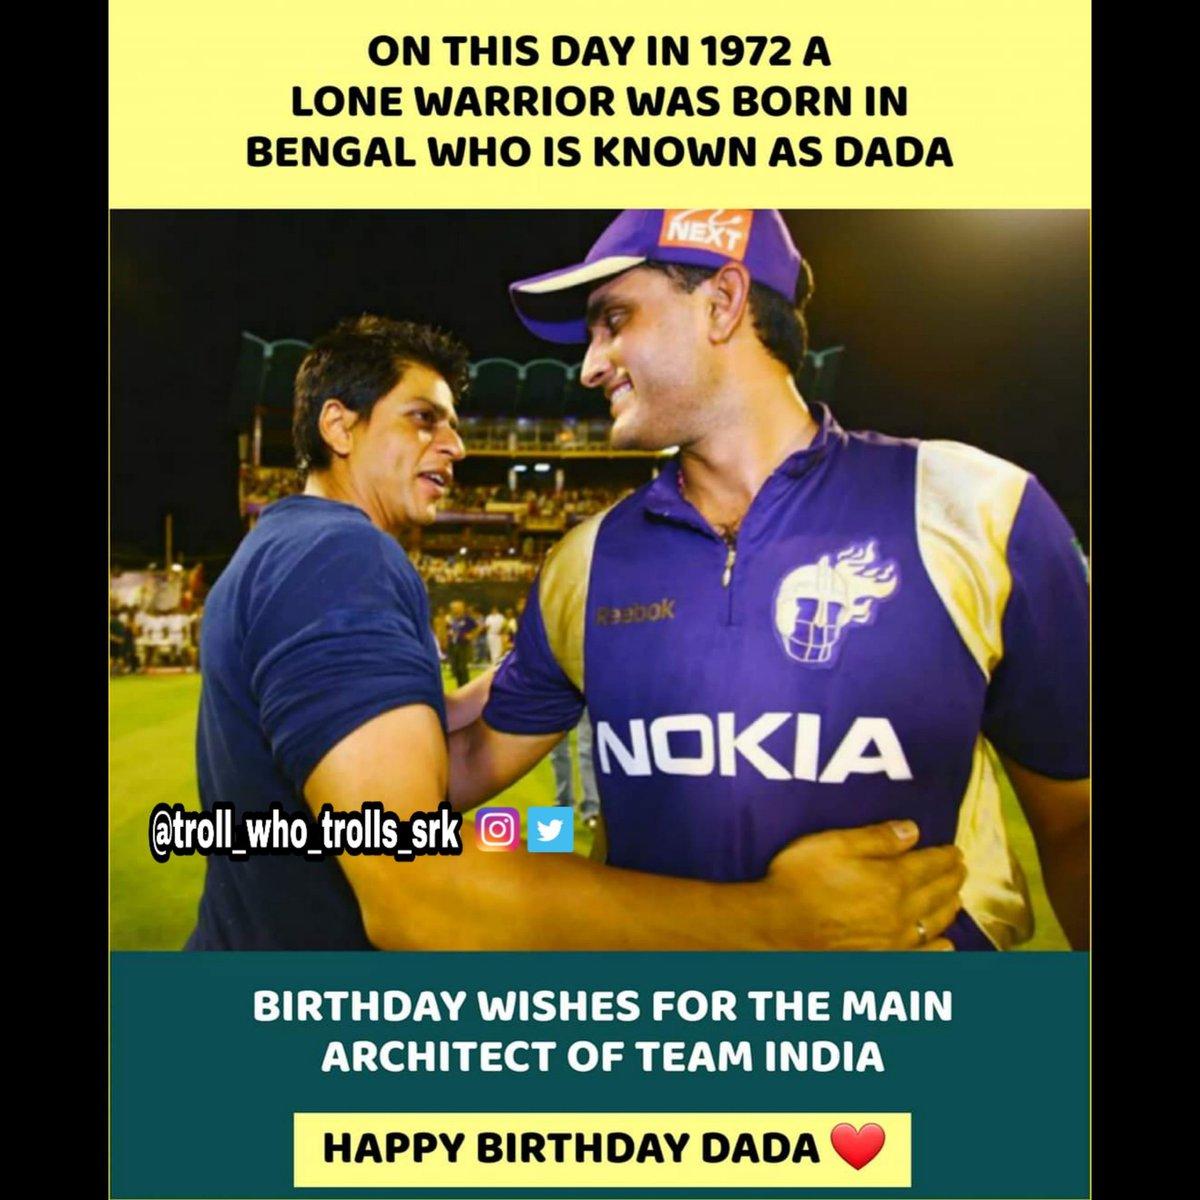 Happy Birthday Dada #HappyBirthdayDada #sauravganguly #Dada #ShahRukhKhan #SRK #Srkians #srkian #SRKCFC #FanTweets #FANART #challenge #srkfan #srkfans #IPL2020 #kkr #Kolkatapic.twitter.com/awNW1eBnMM